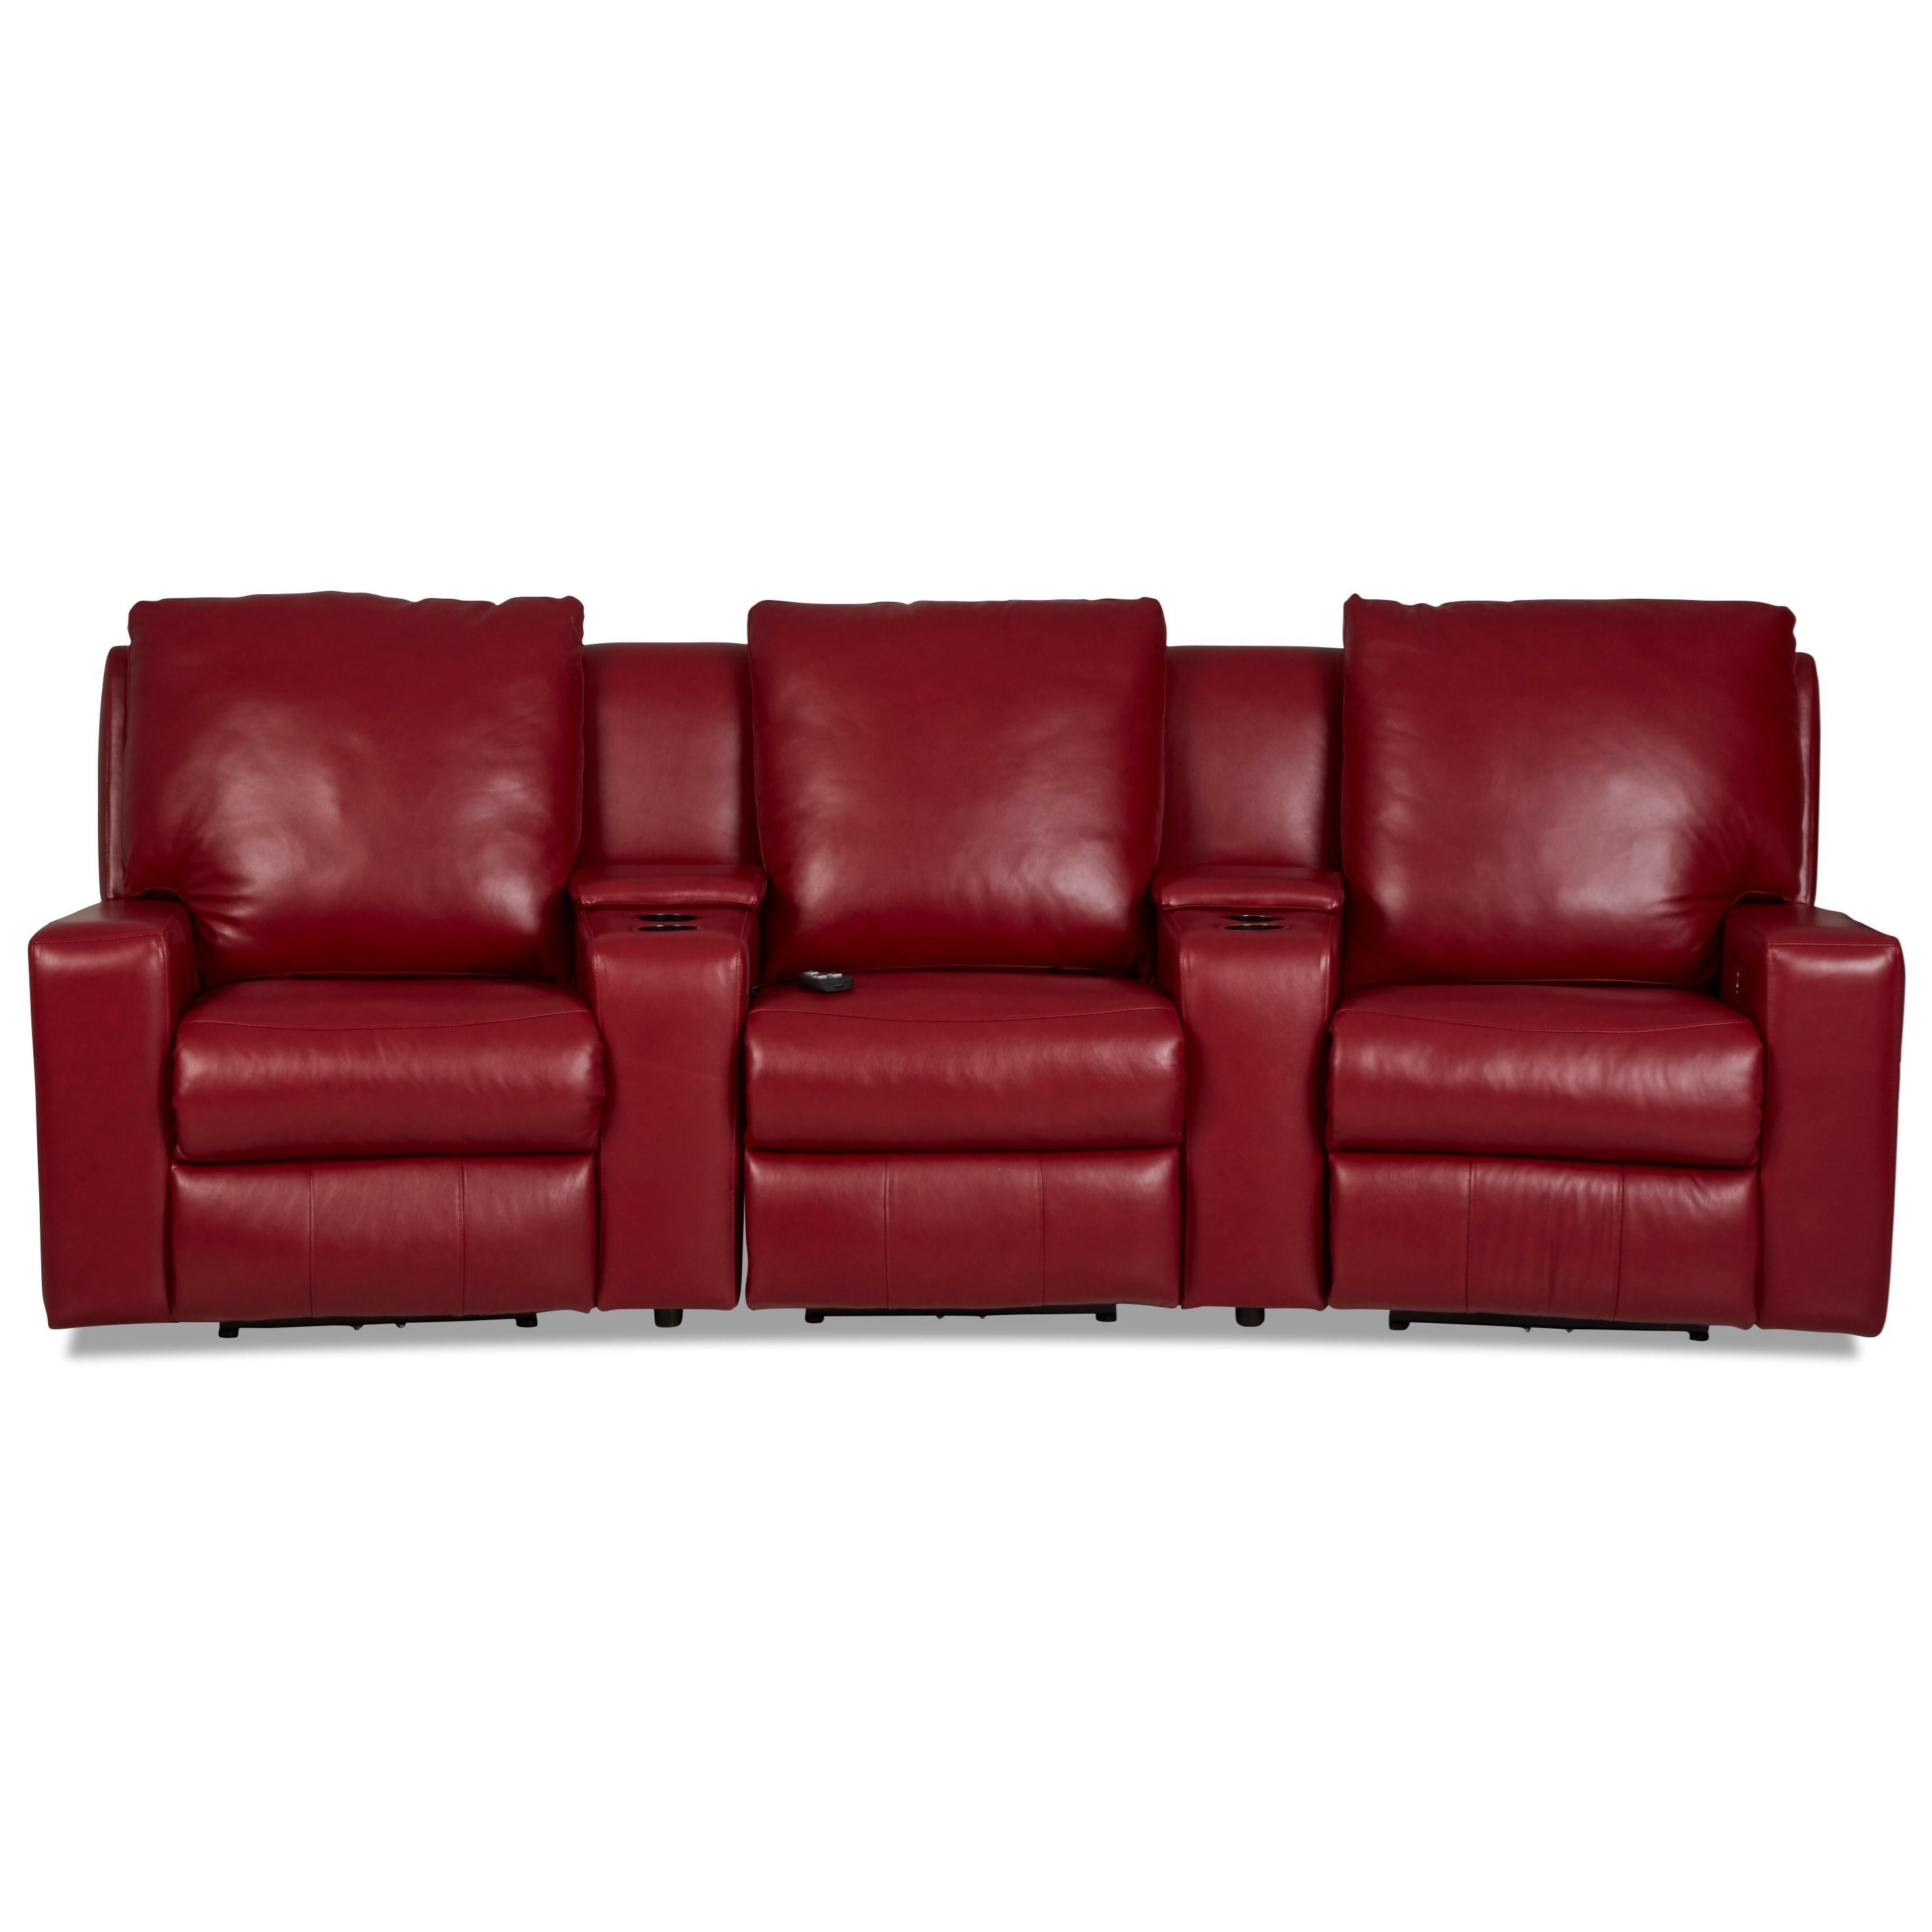 Alliser 3-Seat Theater Seating Group by Klaussner at Pilgrim Furniture City